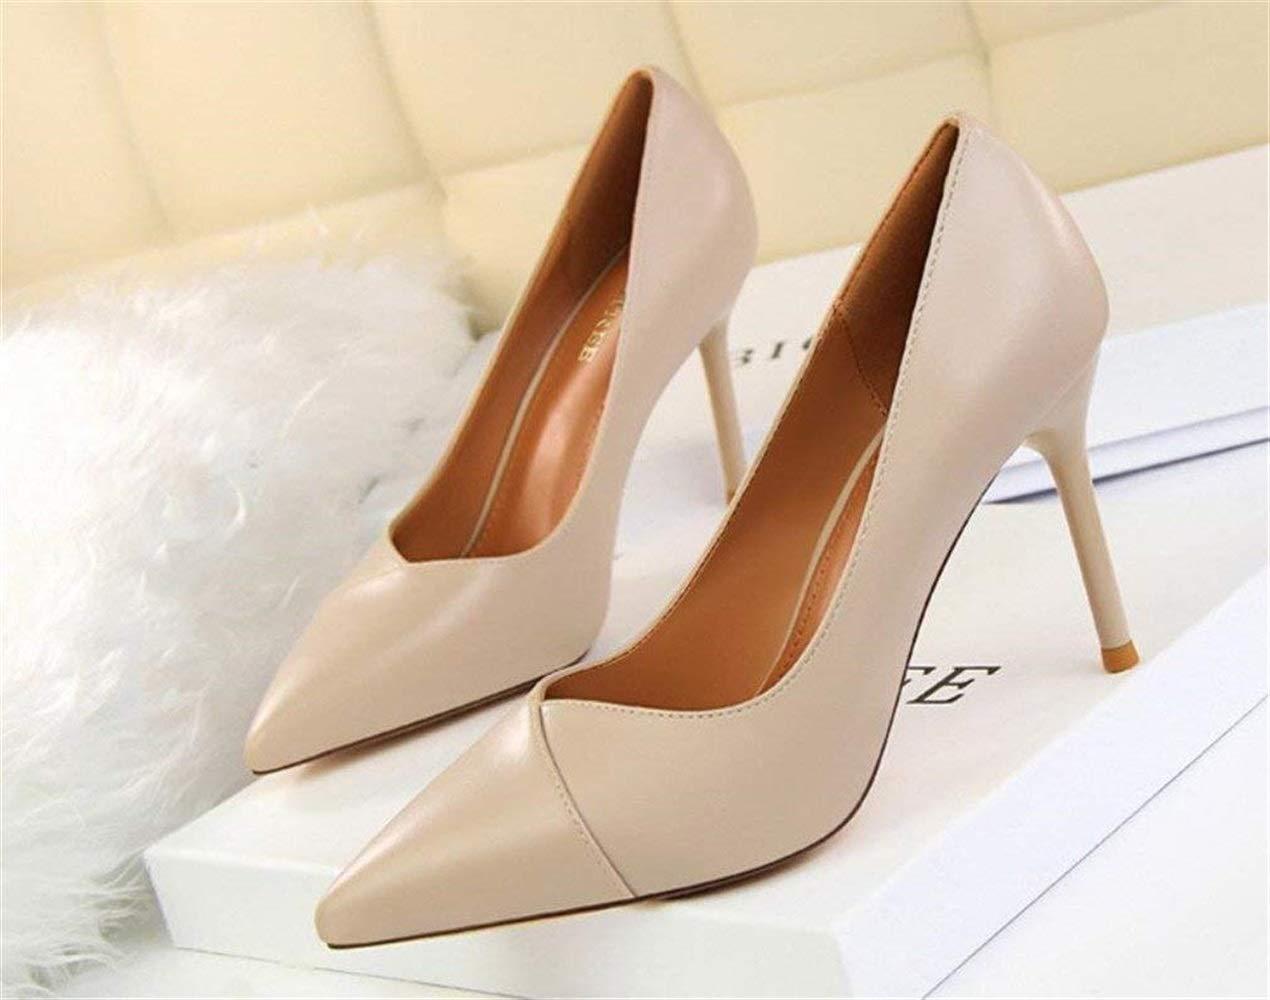 Moontang Court Schuhe High Heels Sandaletten Damen Low Mid Heel Heel Heel Block Peep Toe Damen Knöchelriemen Party Strappy Schuhe, EU37-40 (Farbe   -, Größe   -) 5f08a9